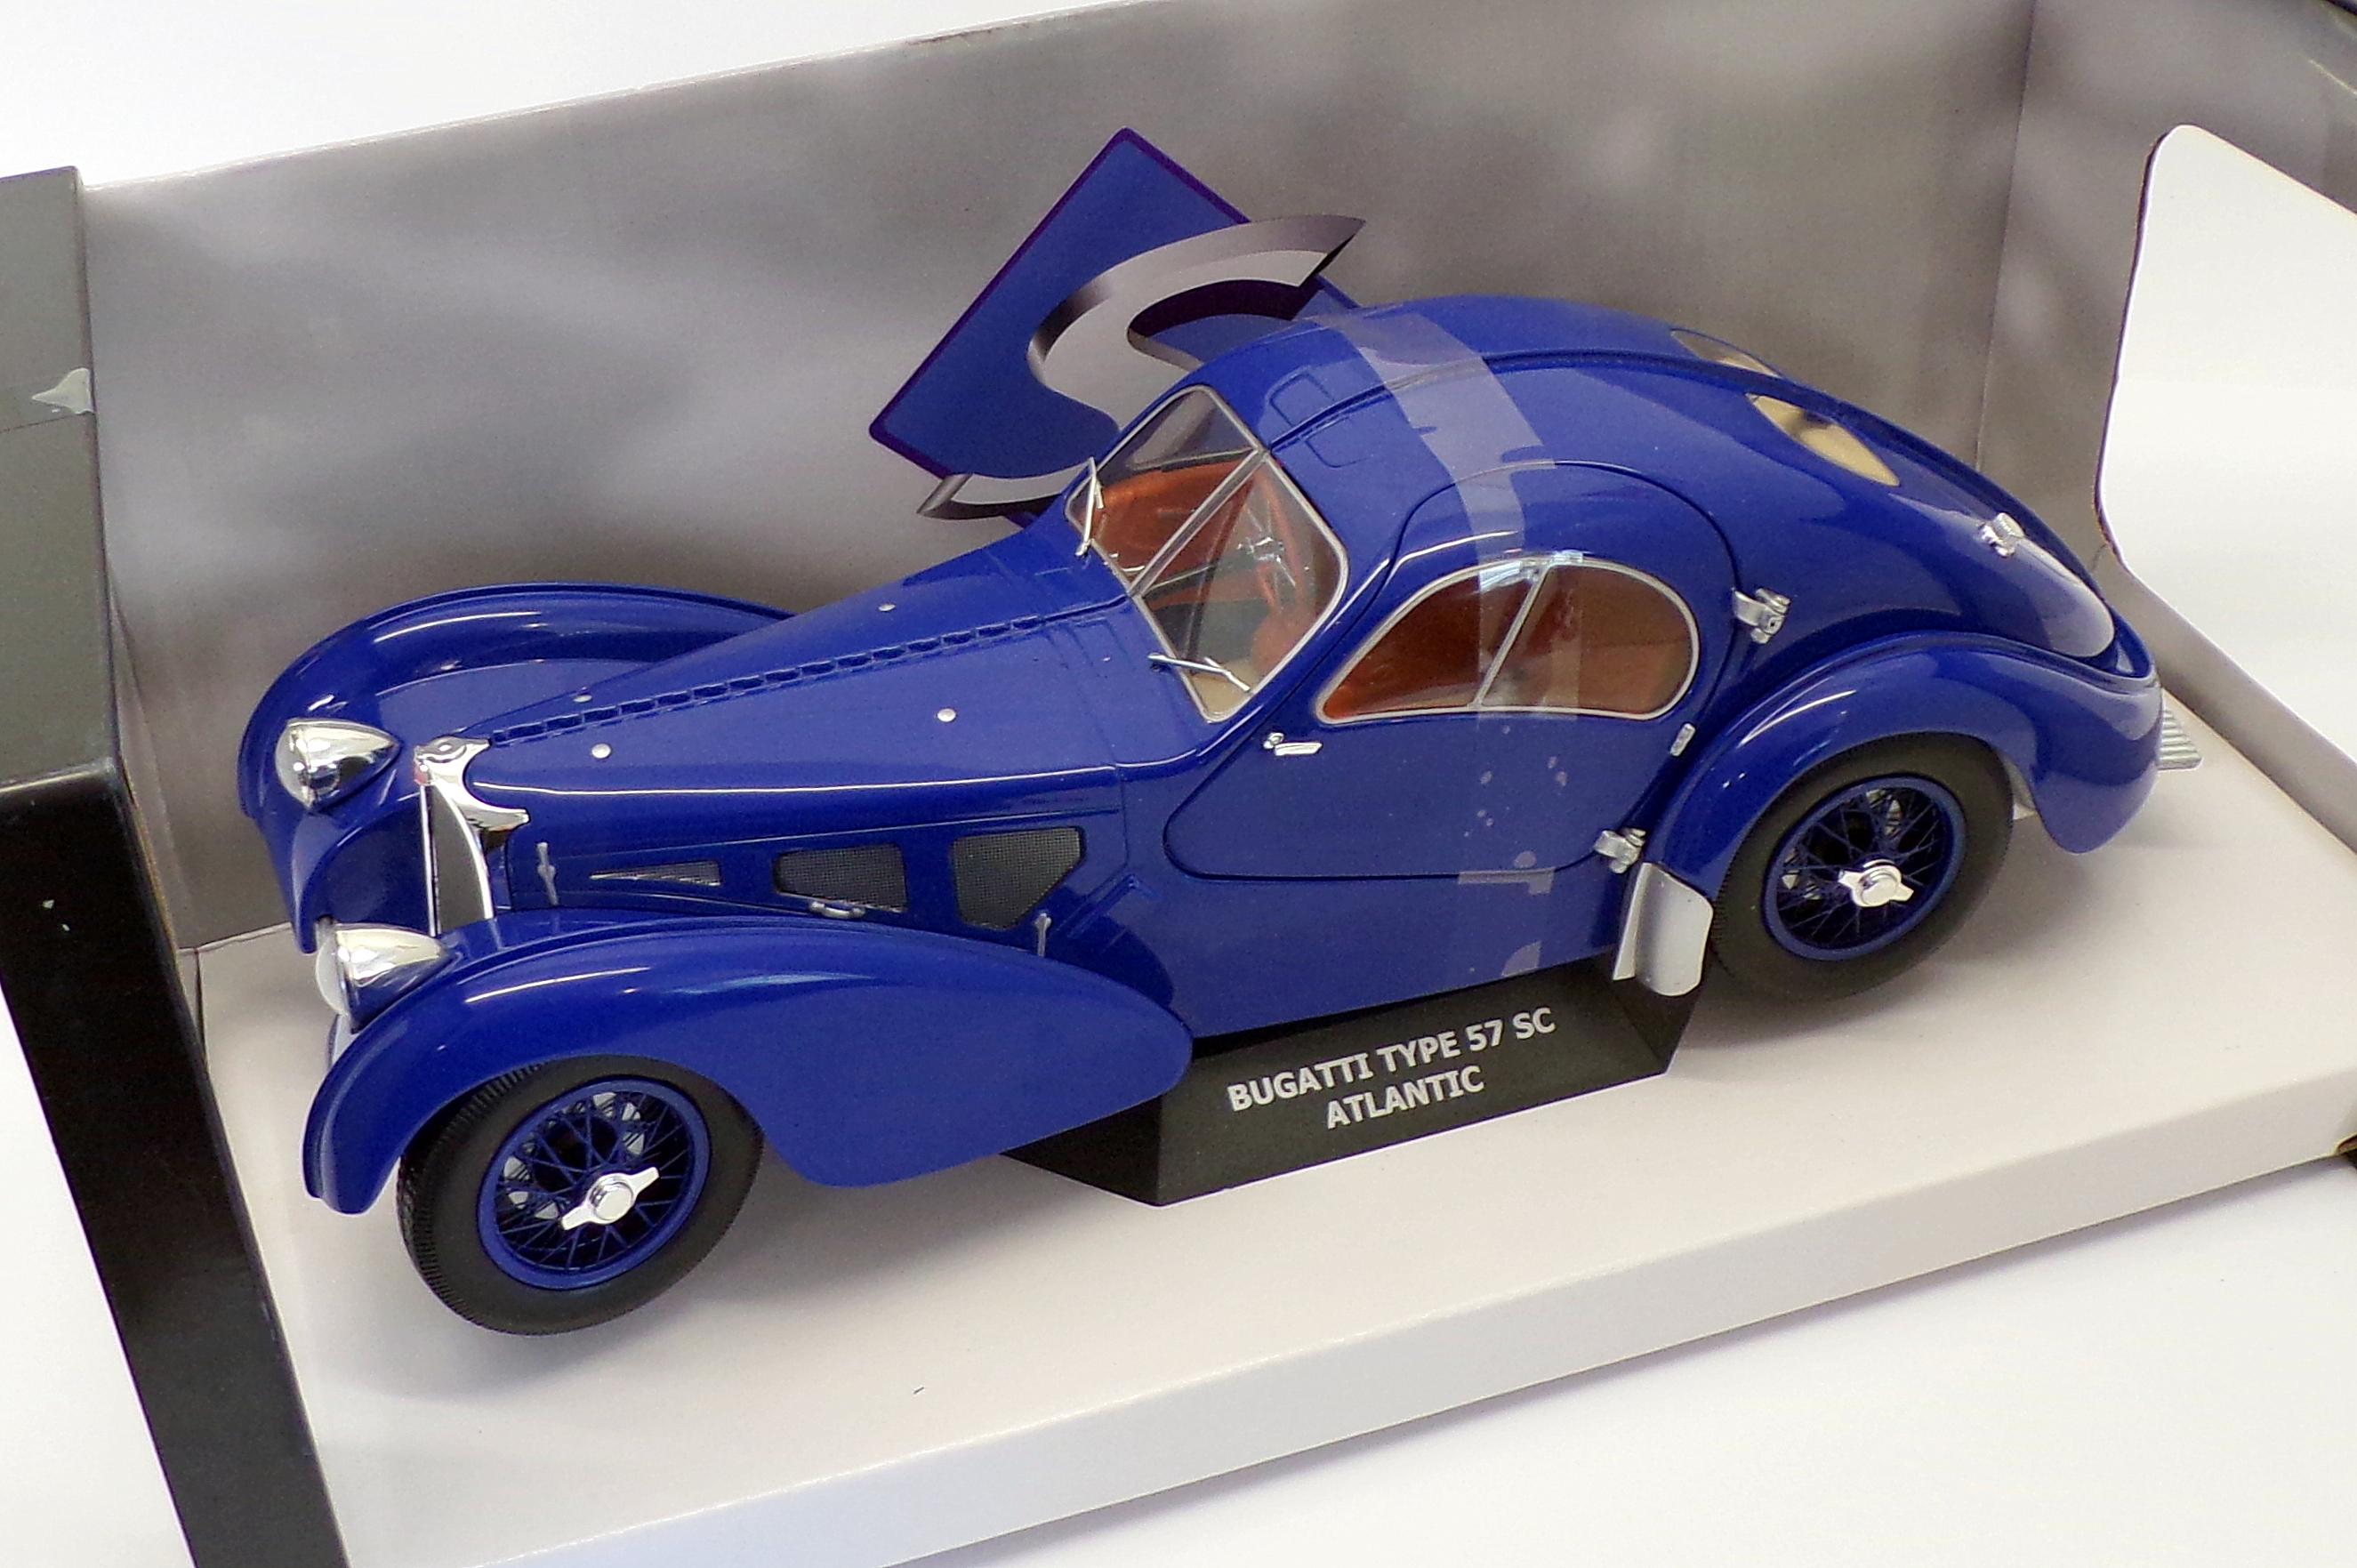 Solido Escala 1 18 Carro Modelo S1802103 Bugatti Type 57 Sc Atlantic Azul Ebay